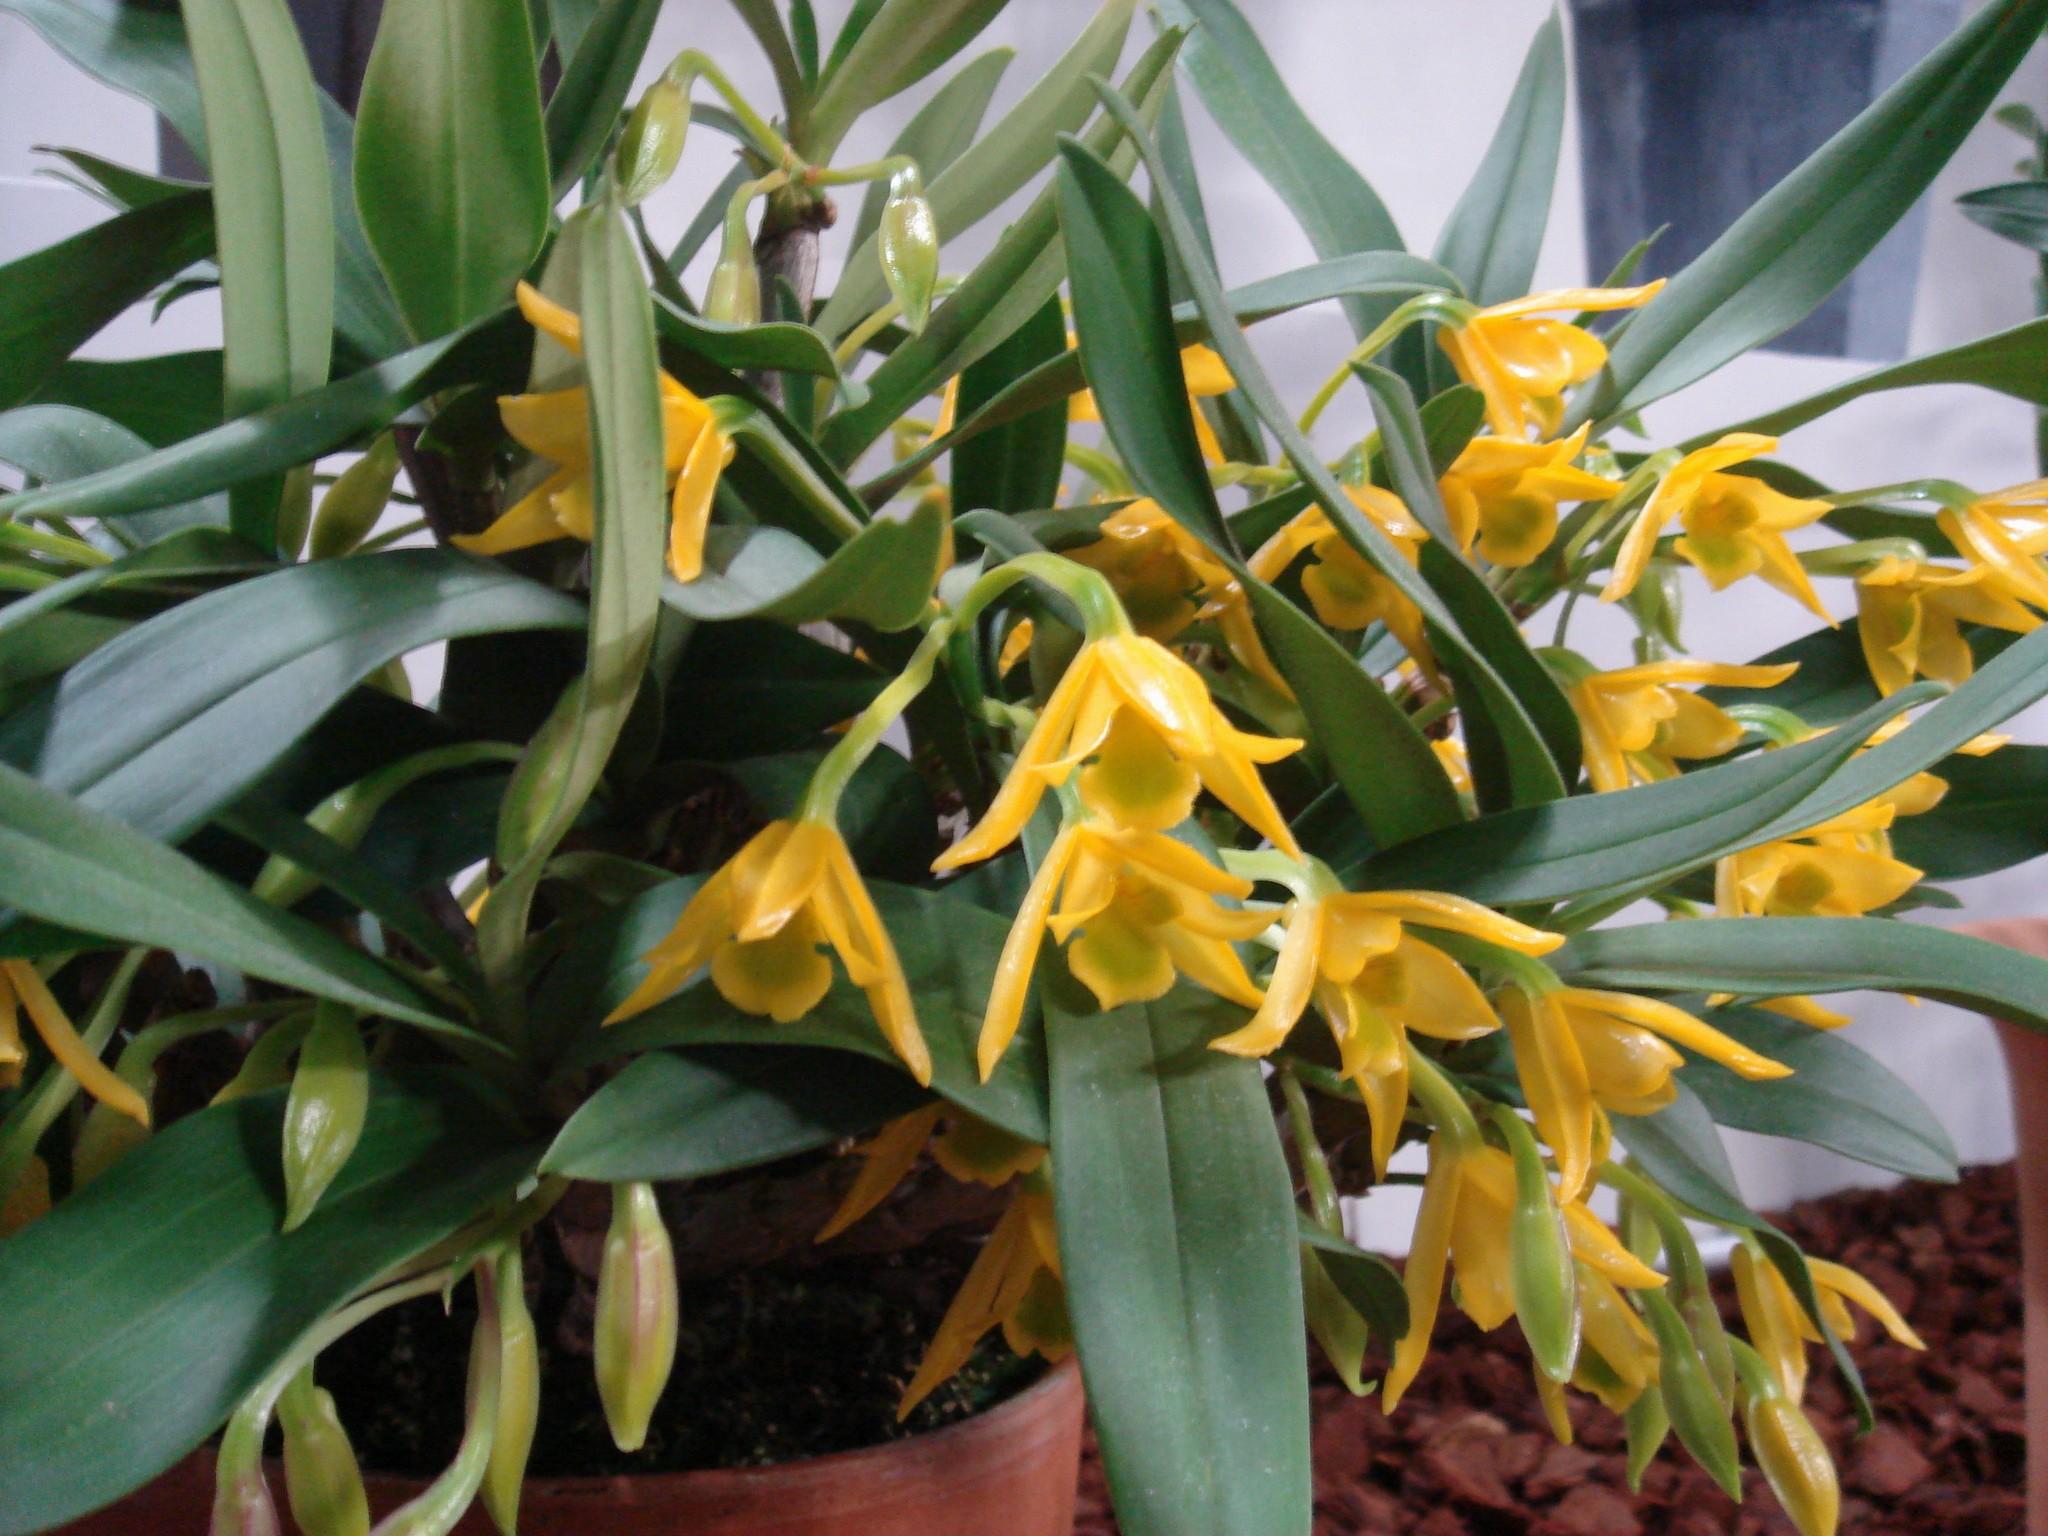 http://orchids.la.coocan.jp/Dendrobium/Dendrobium%20trigonopus/DSC06458.JPG